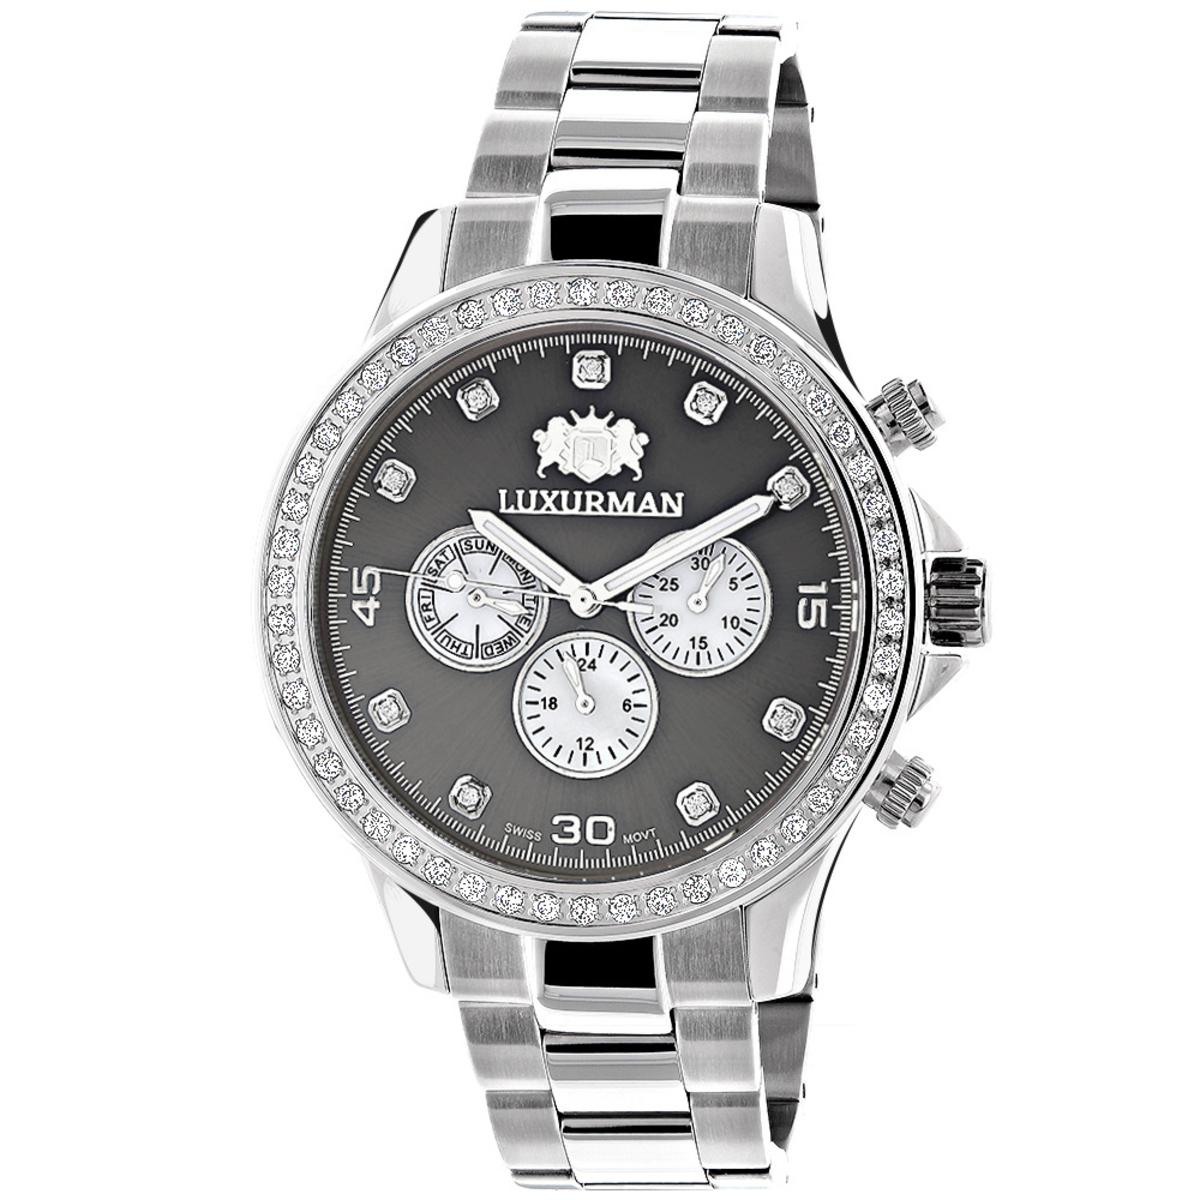 Genuine Diamond Watches For Men: 2ct Luxurman Liberty Watch Swiss Quartz